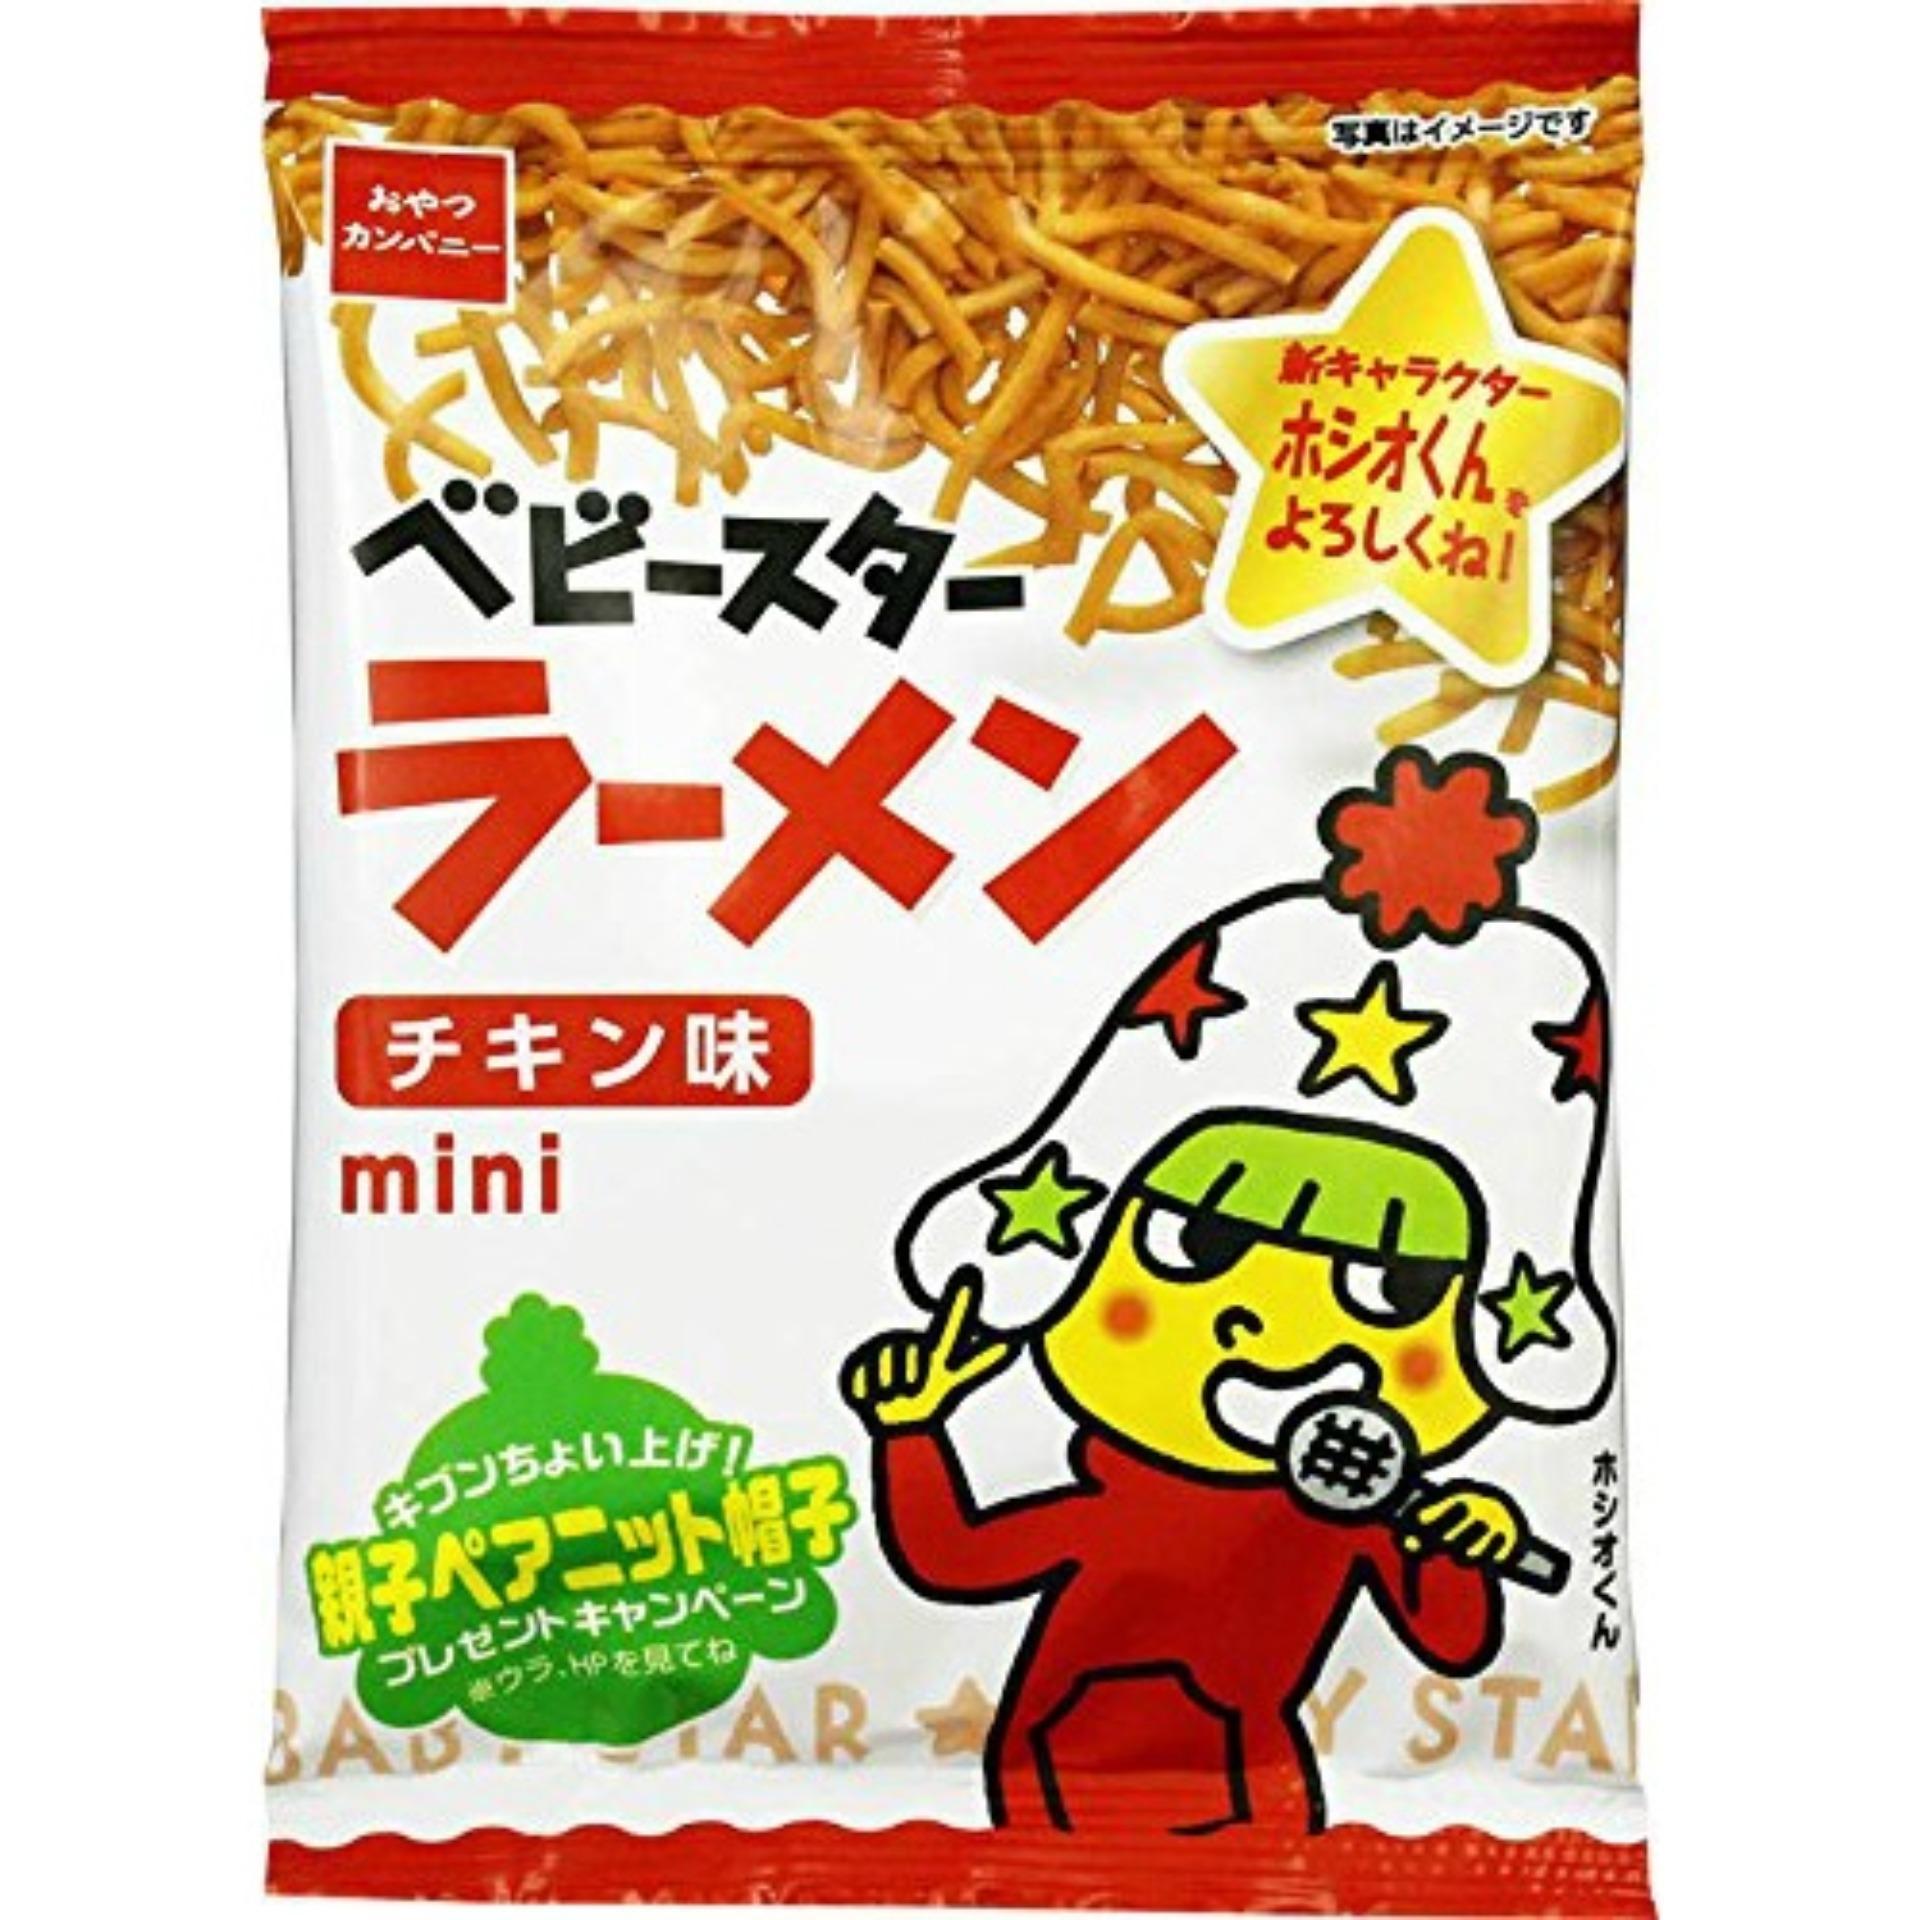 Snack Mini Ramen vị Thịt gà